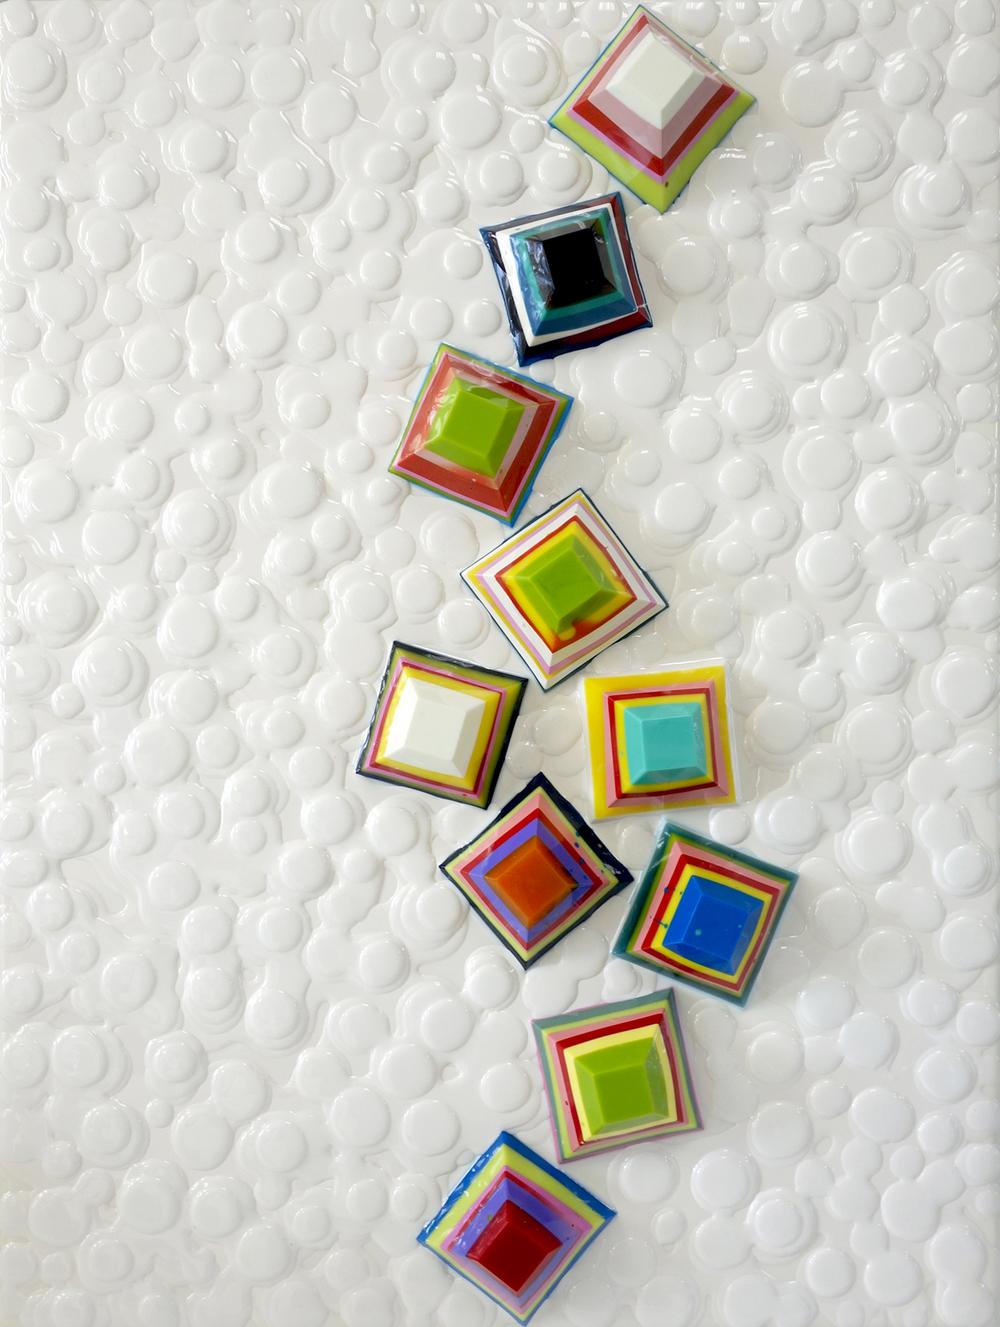 Dispersion Series